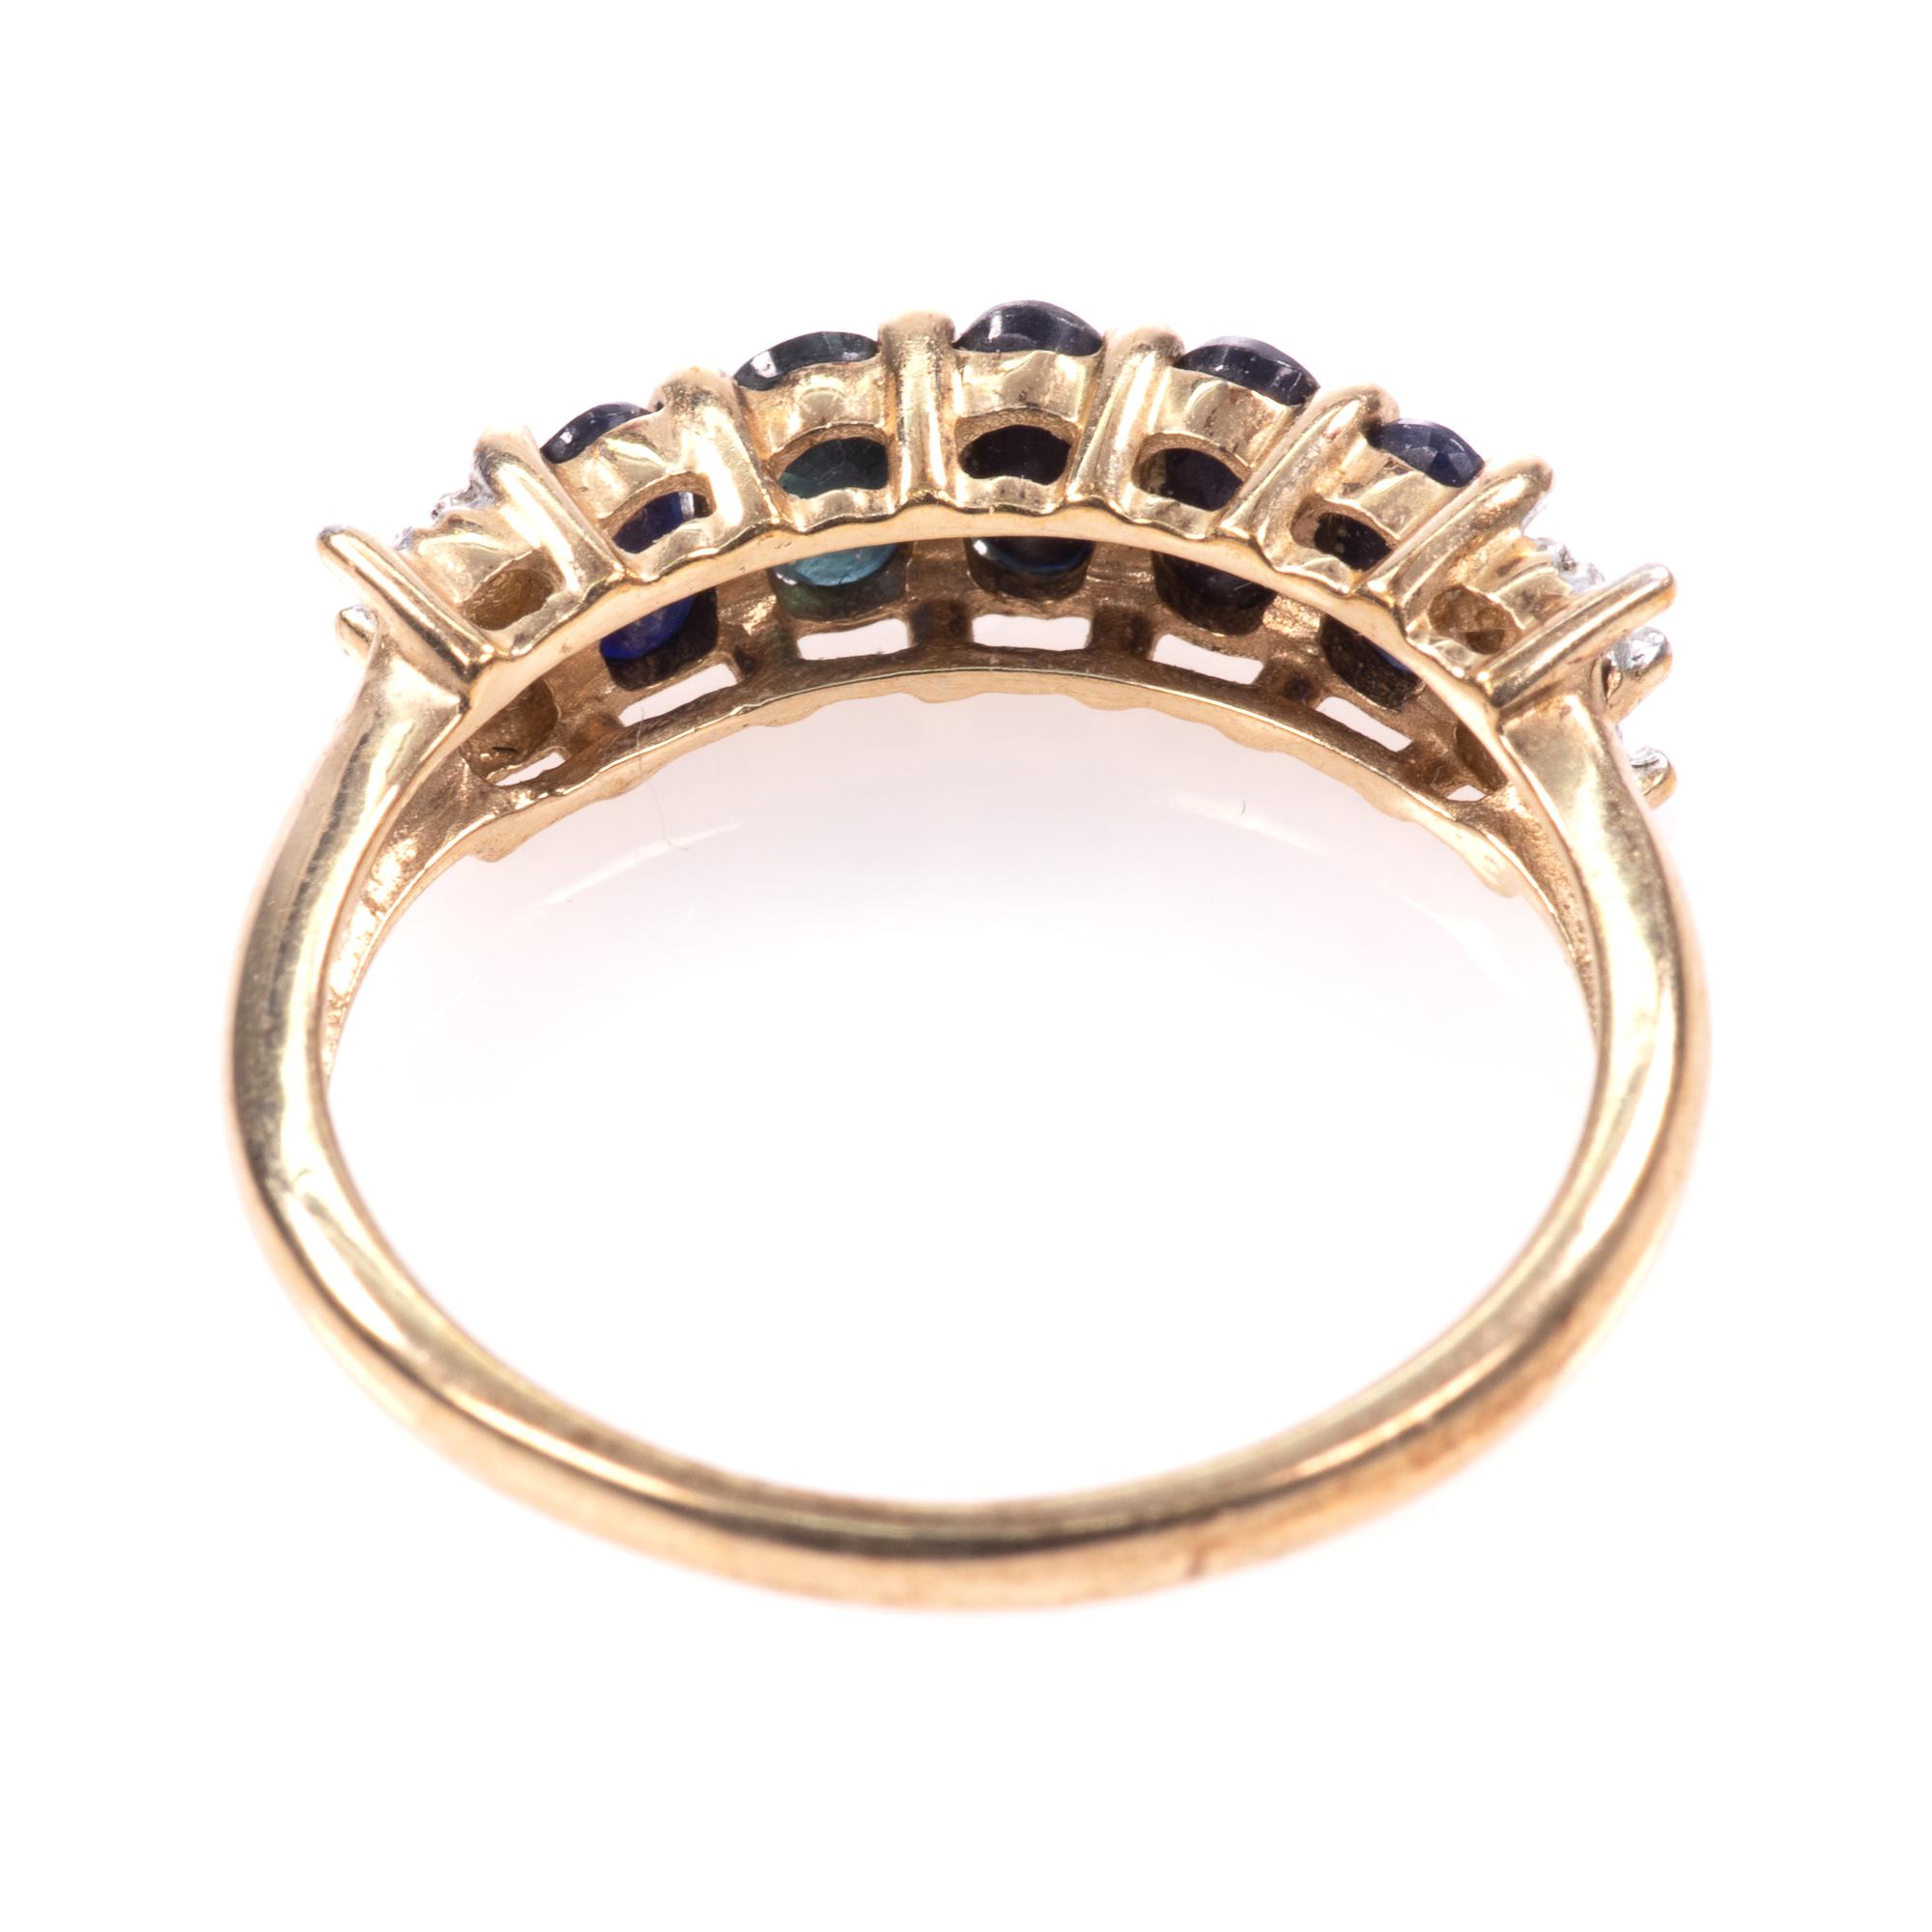 9ct Gold 5ct Sapphire & Diamond Ring - Image 5 of 7